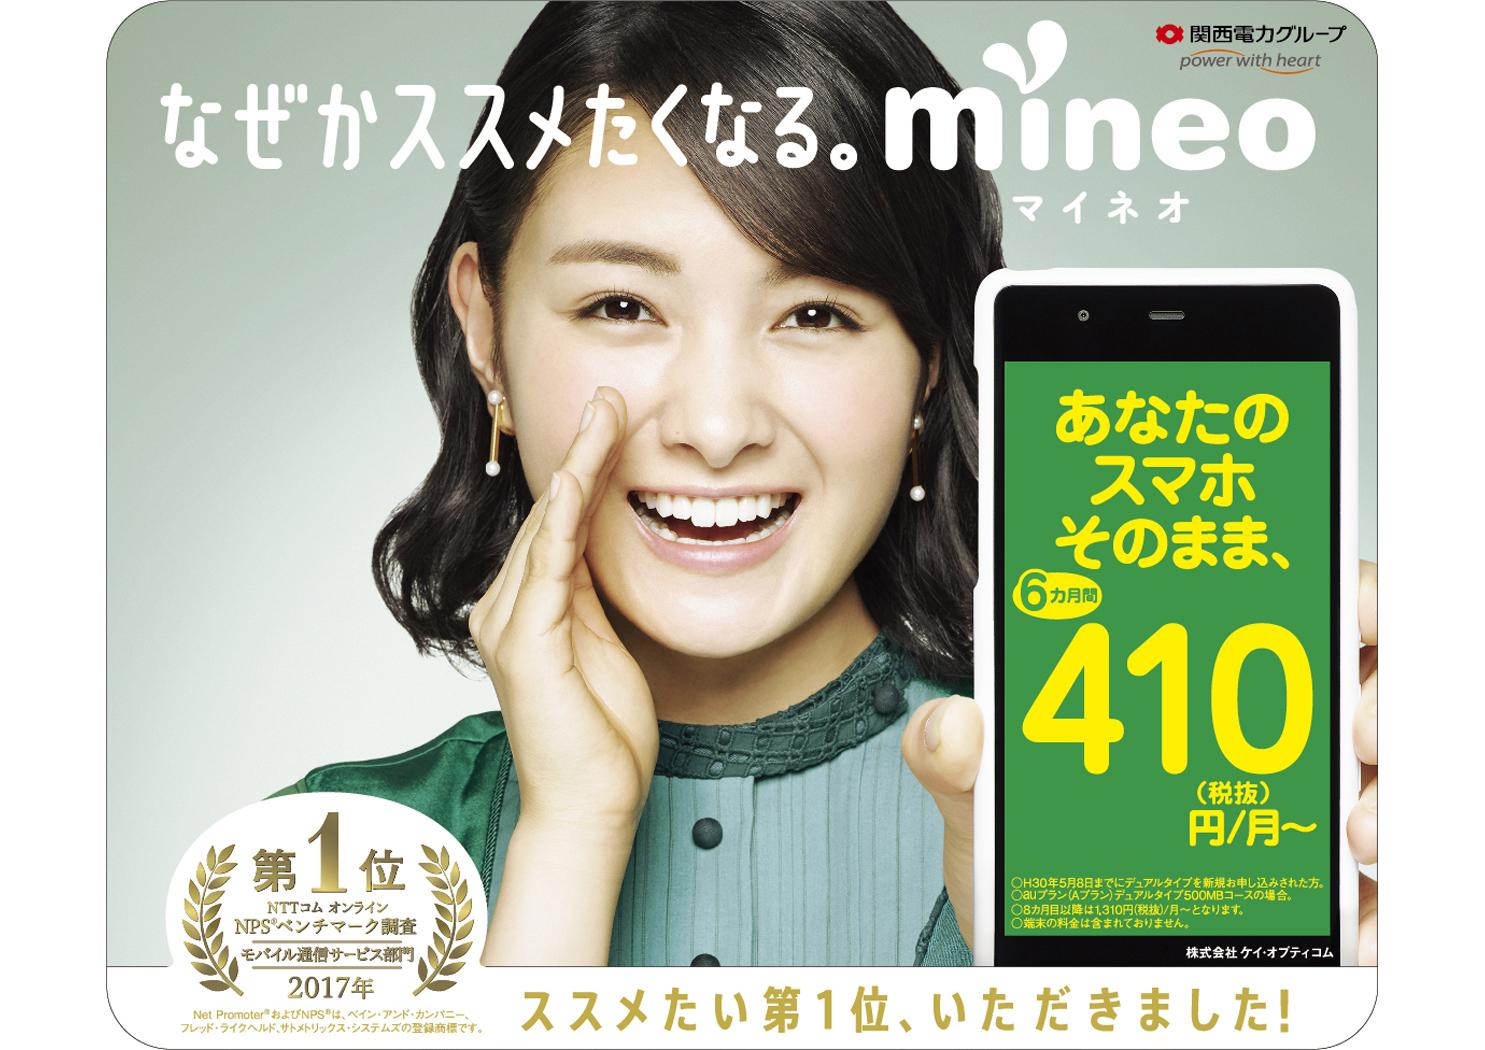 mineo sticker